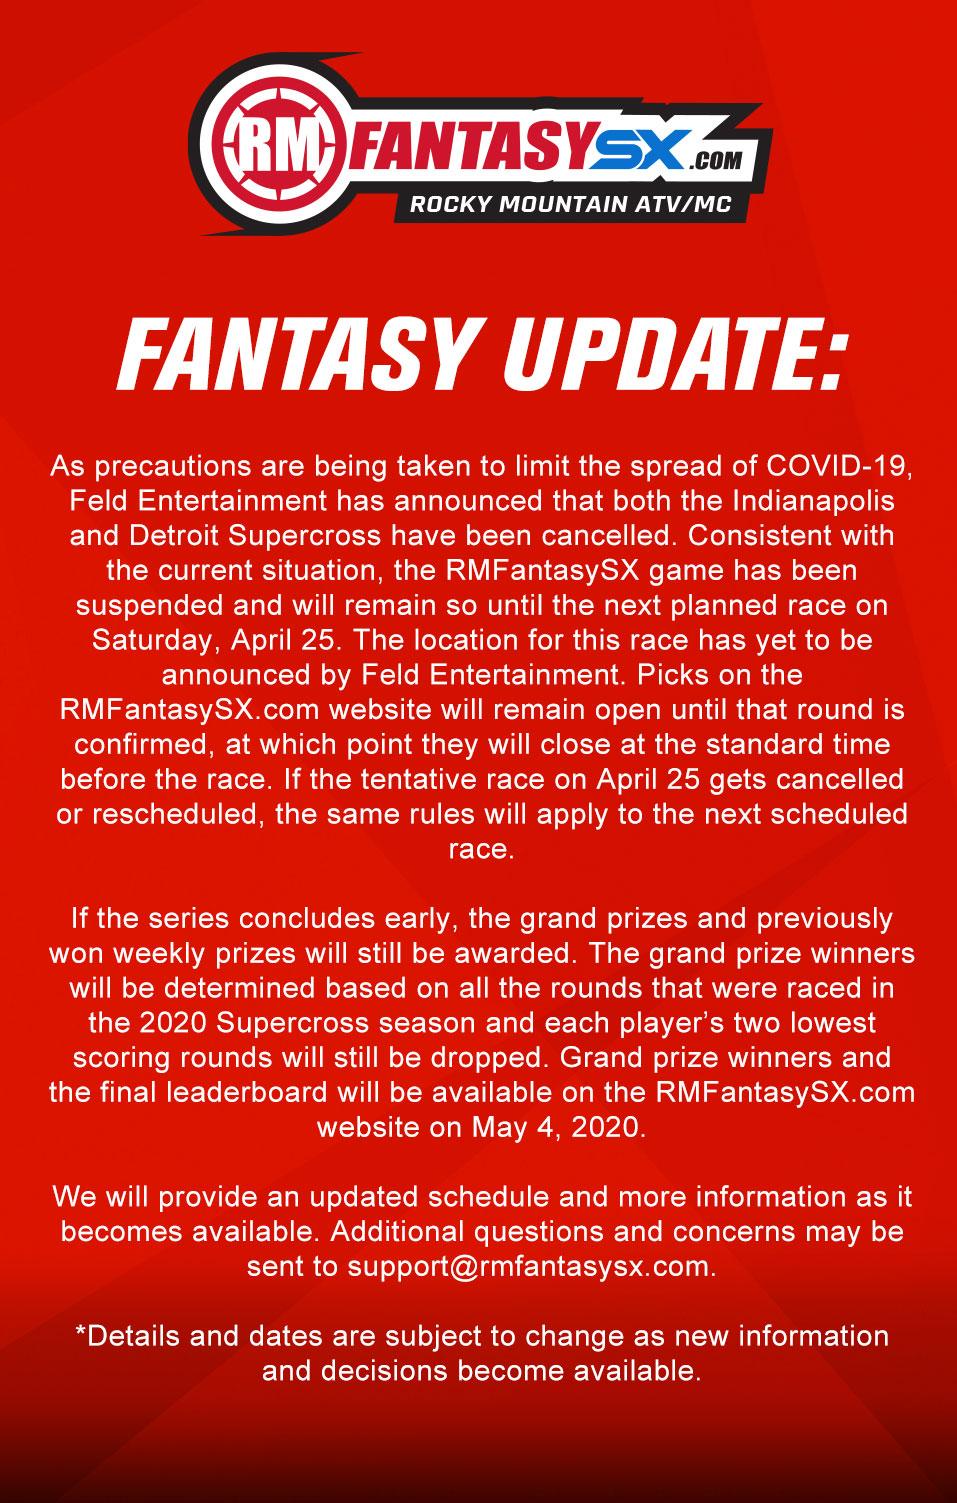 2020 RMFantasySX Season Suspended Update